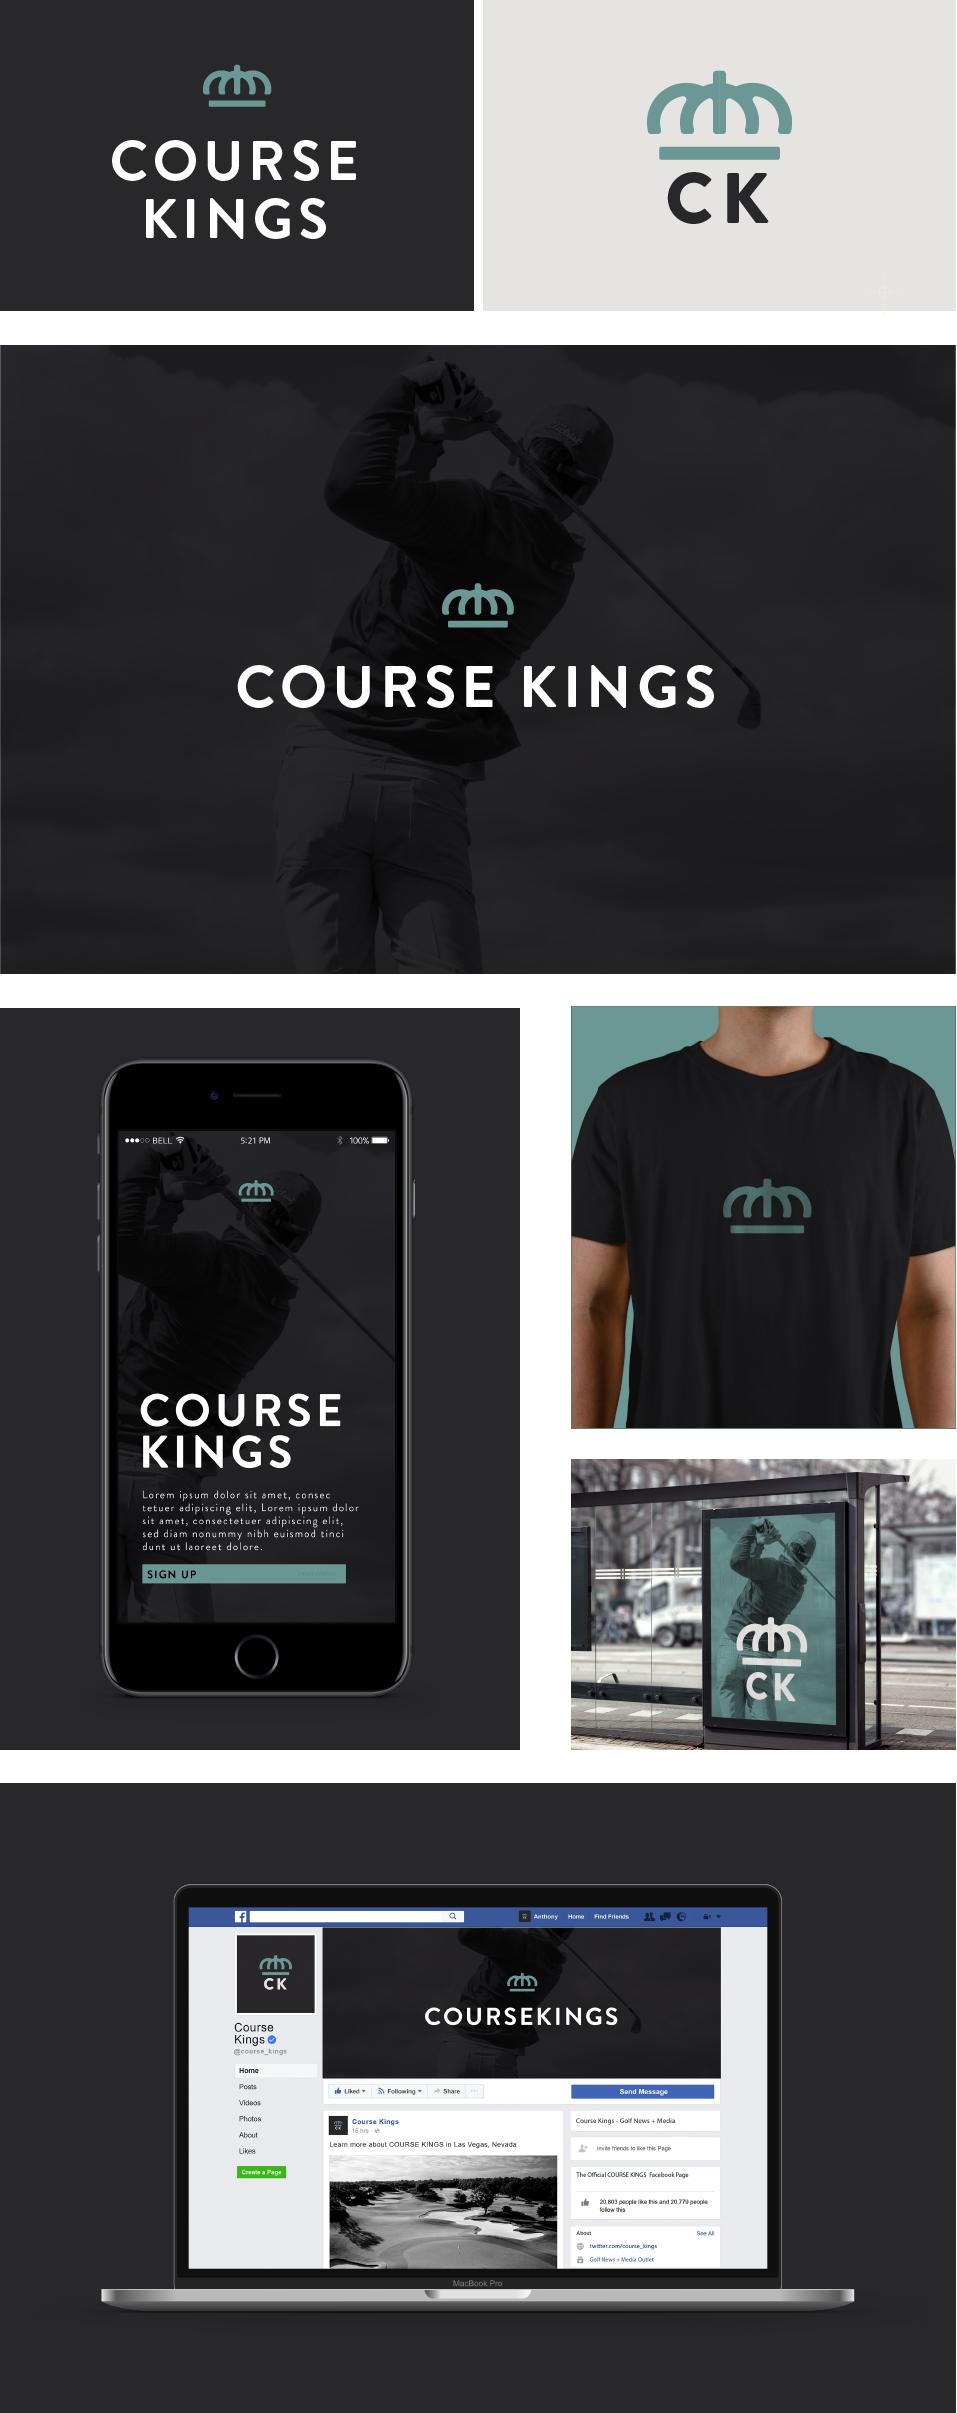 Course Kings Branding Design Draft